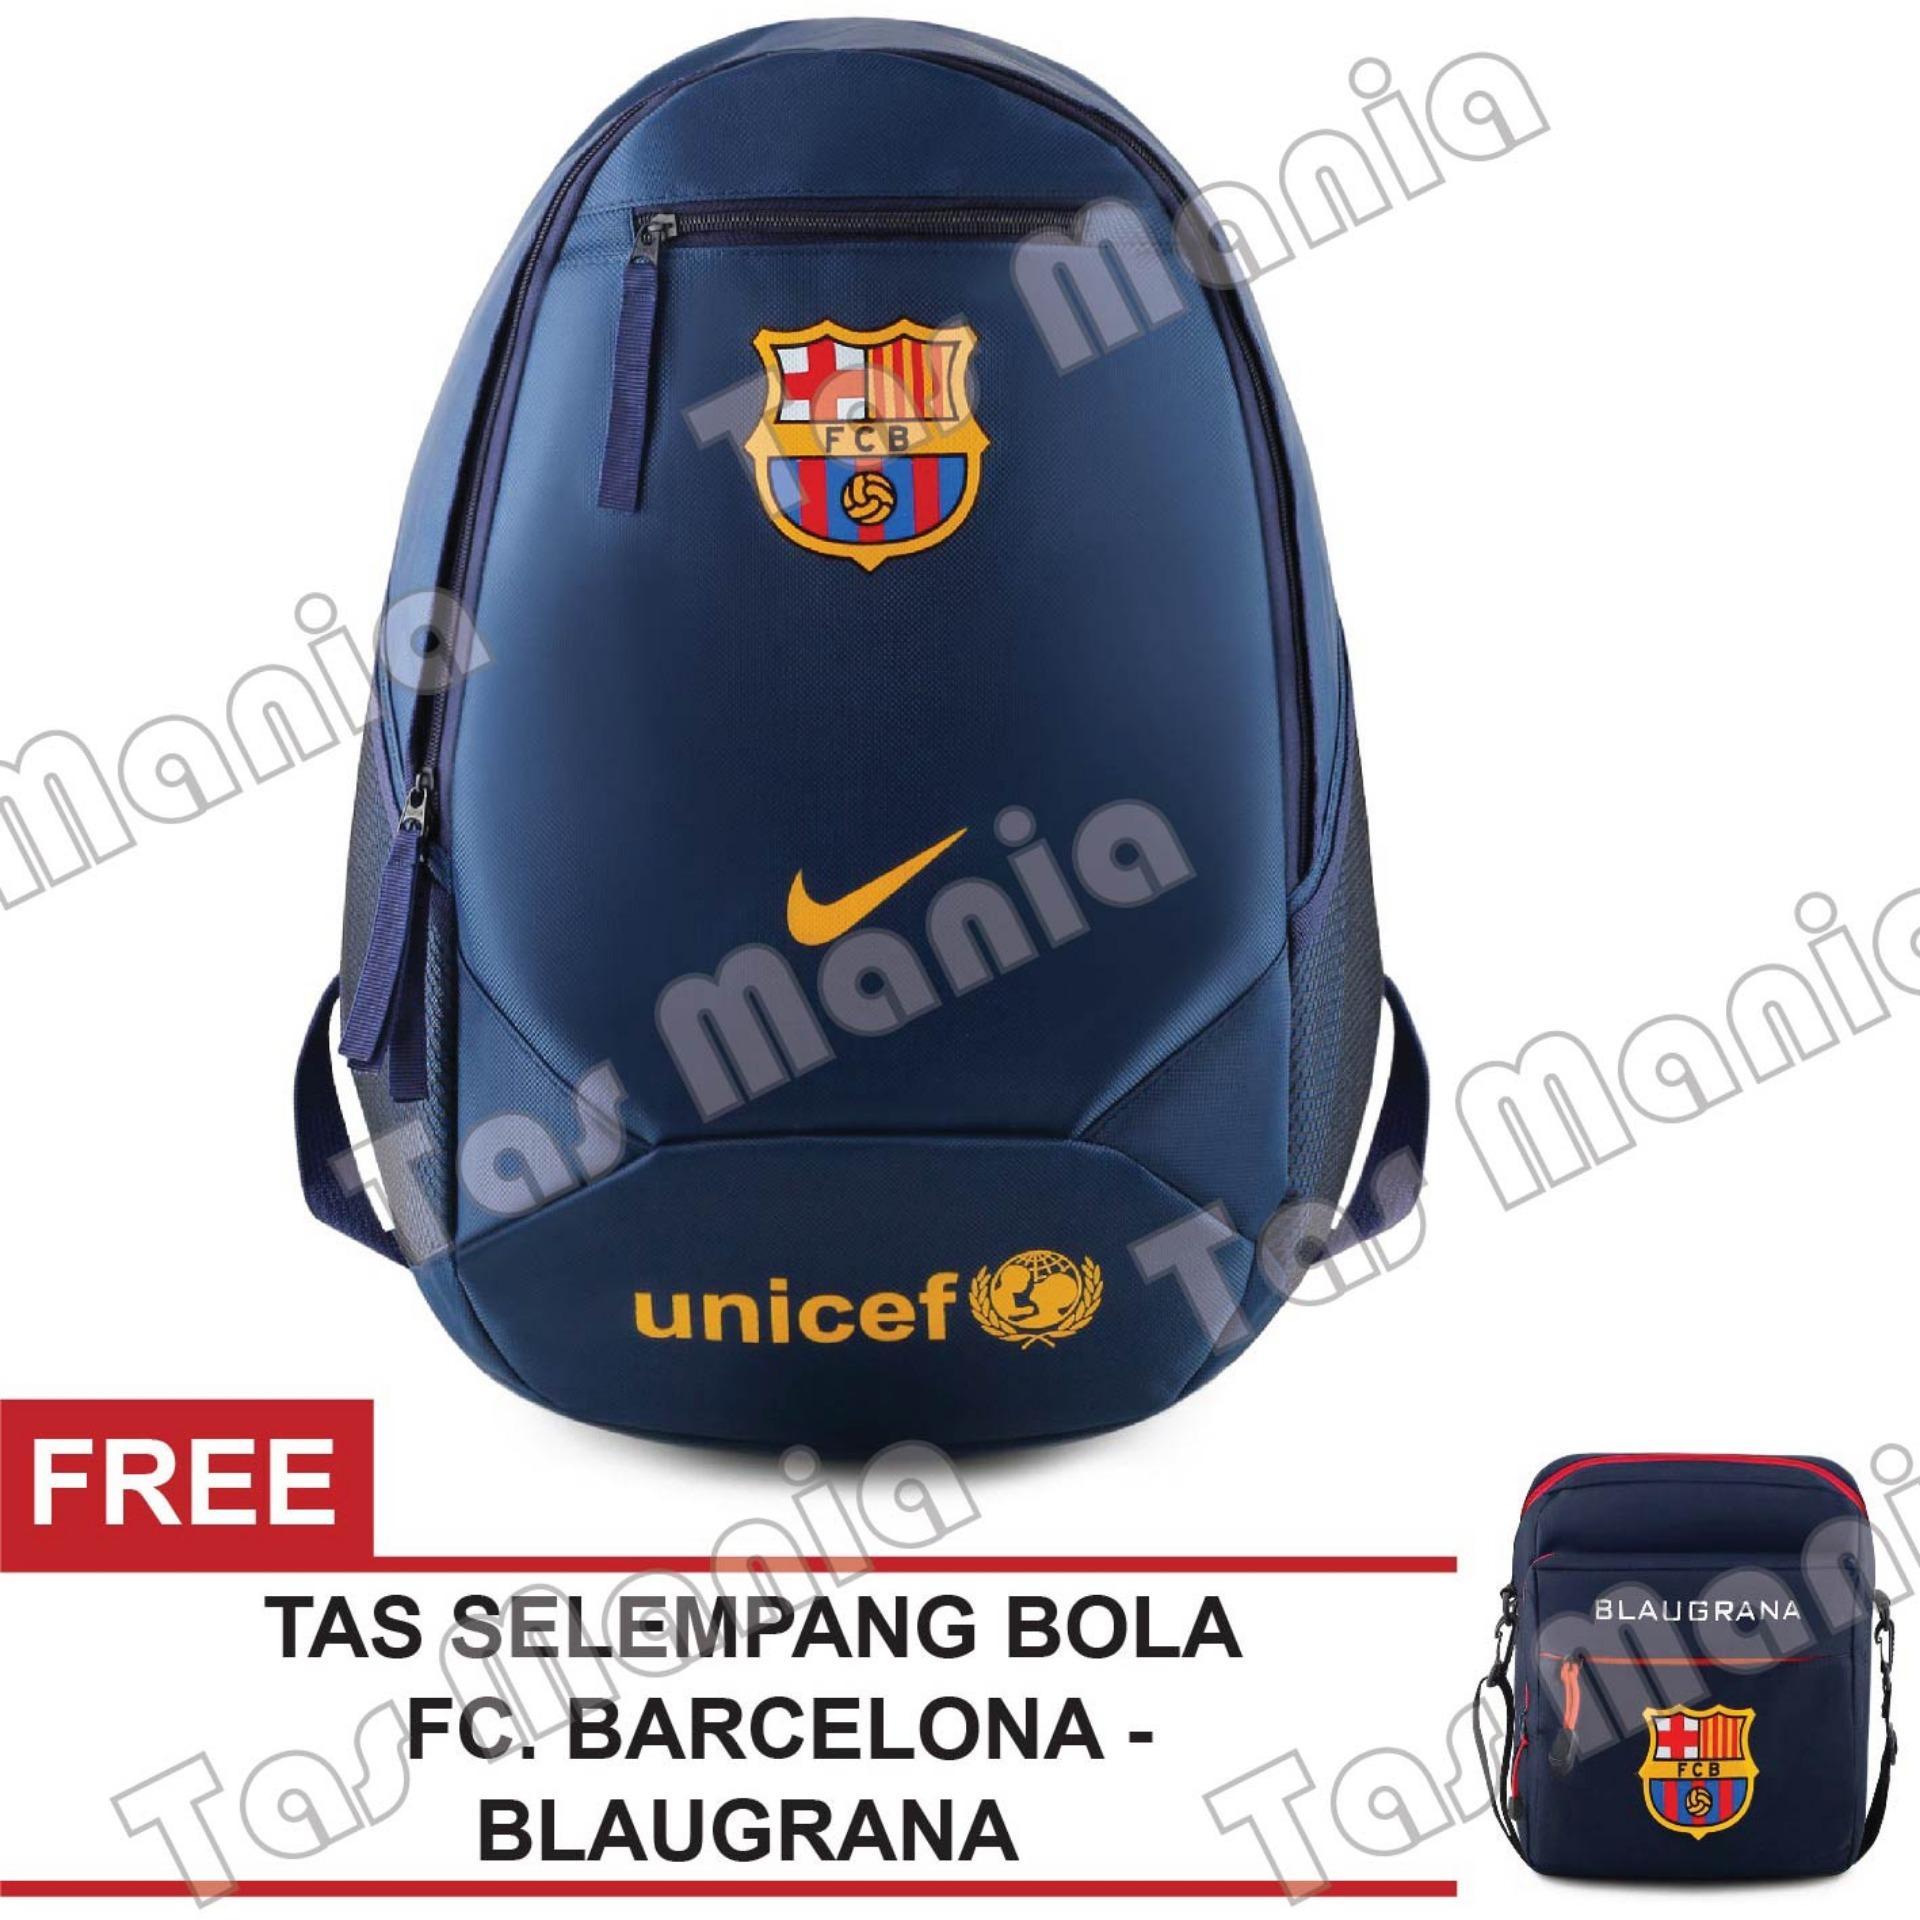 Tas Ransel Nike Bola Pria FC Barcelona - UNICEF Laptop Backpack Men Soccer Editions - Navy + Raincover + FREE Tas Selempang FC Barcelona - Blaugrana - Navy